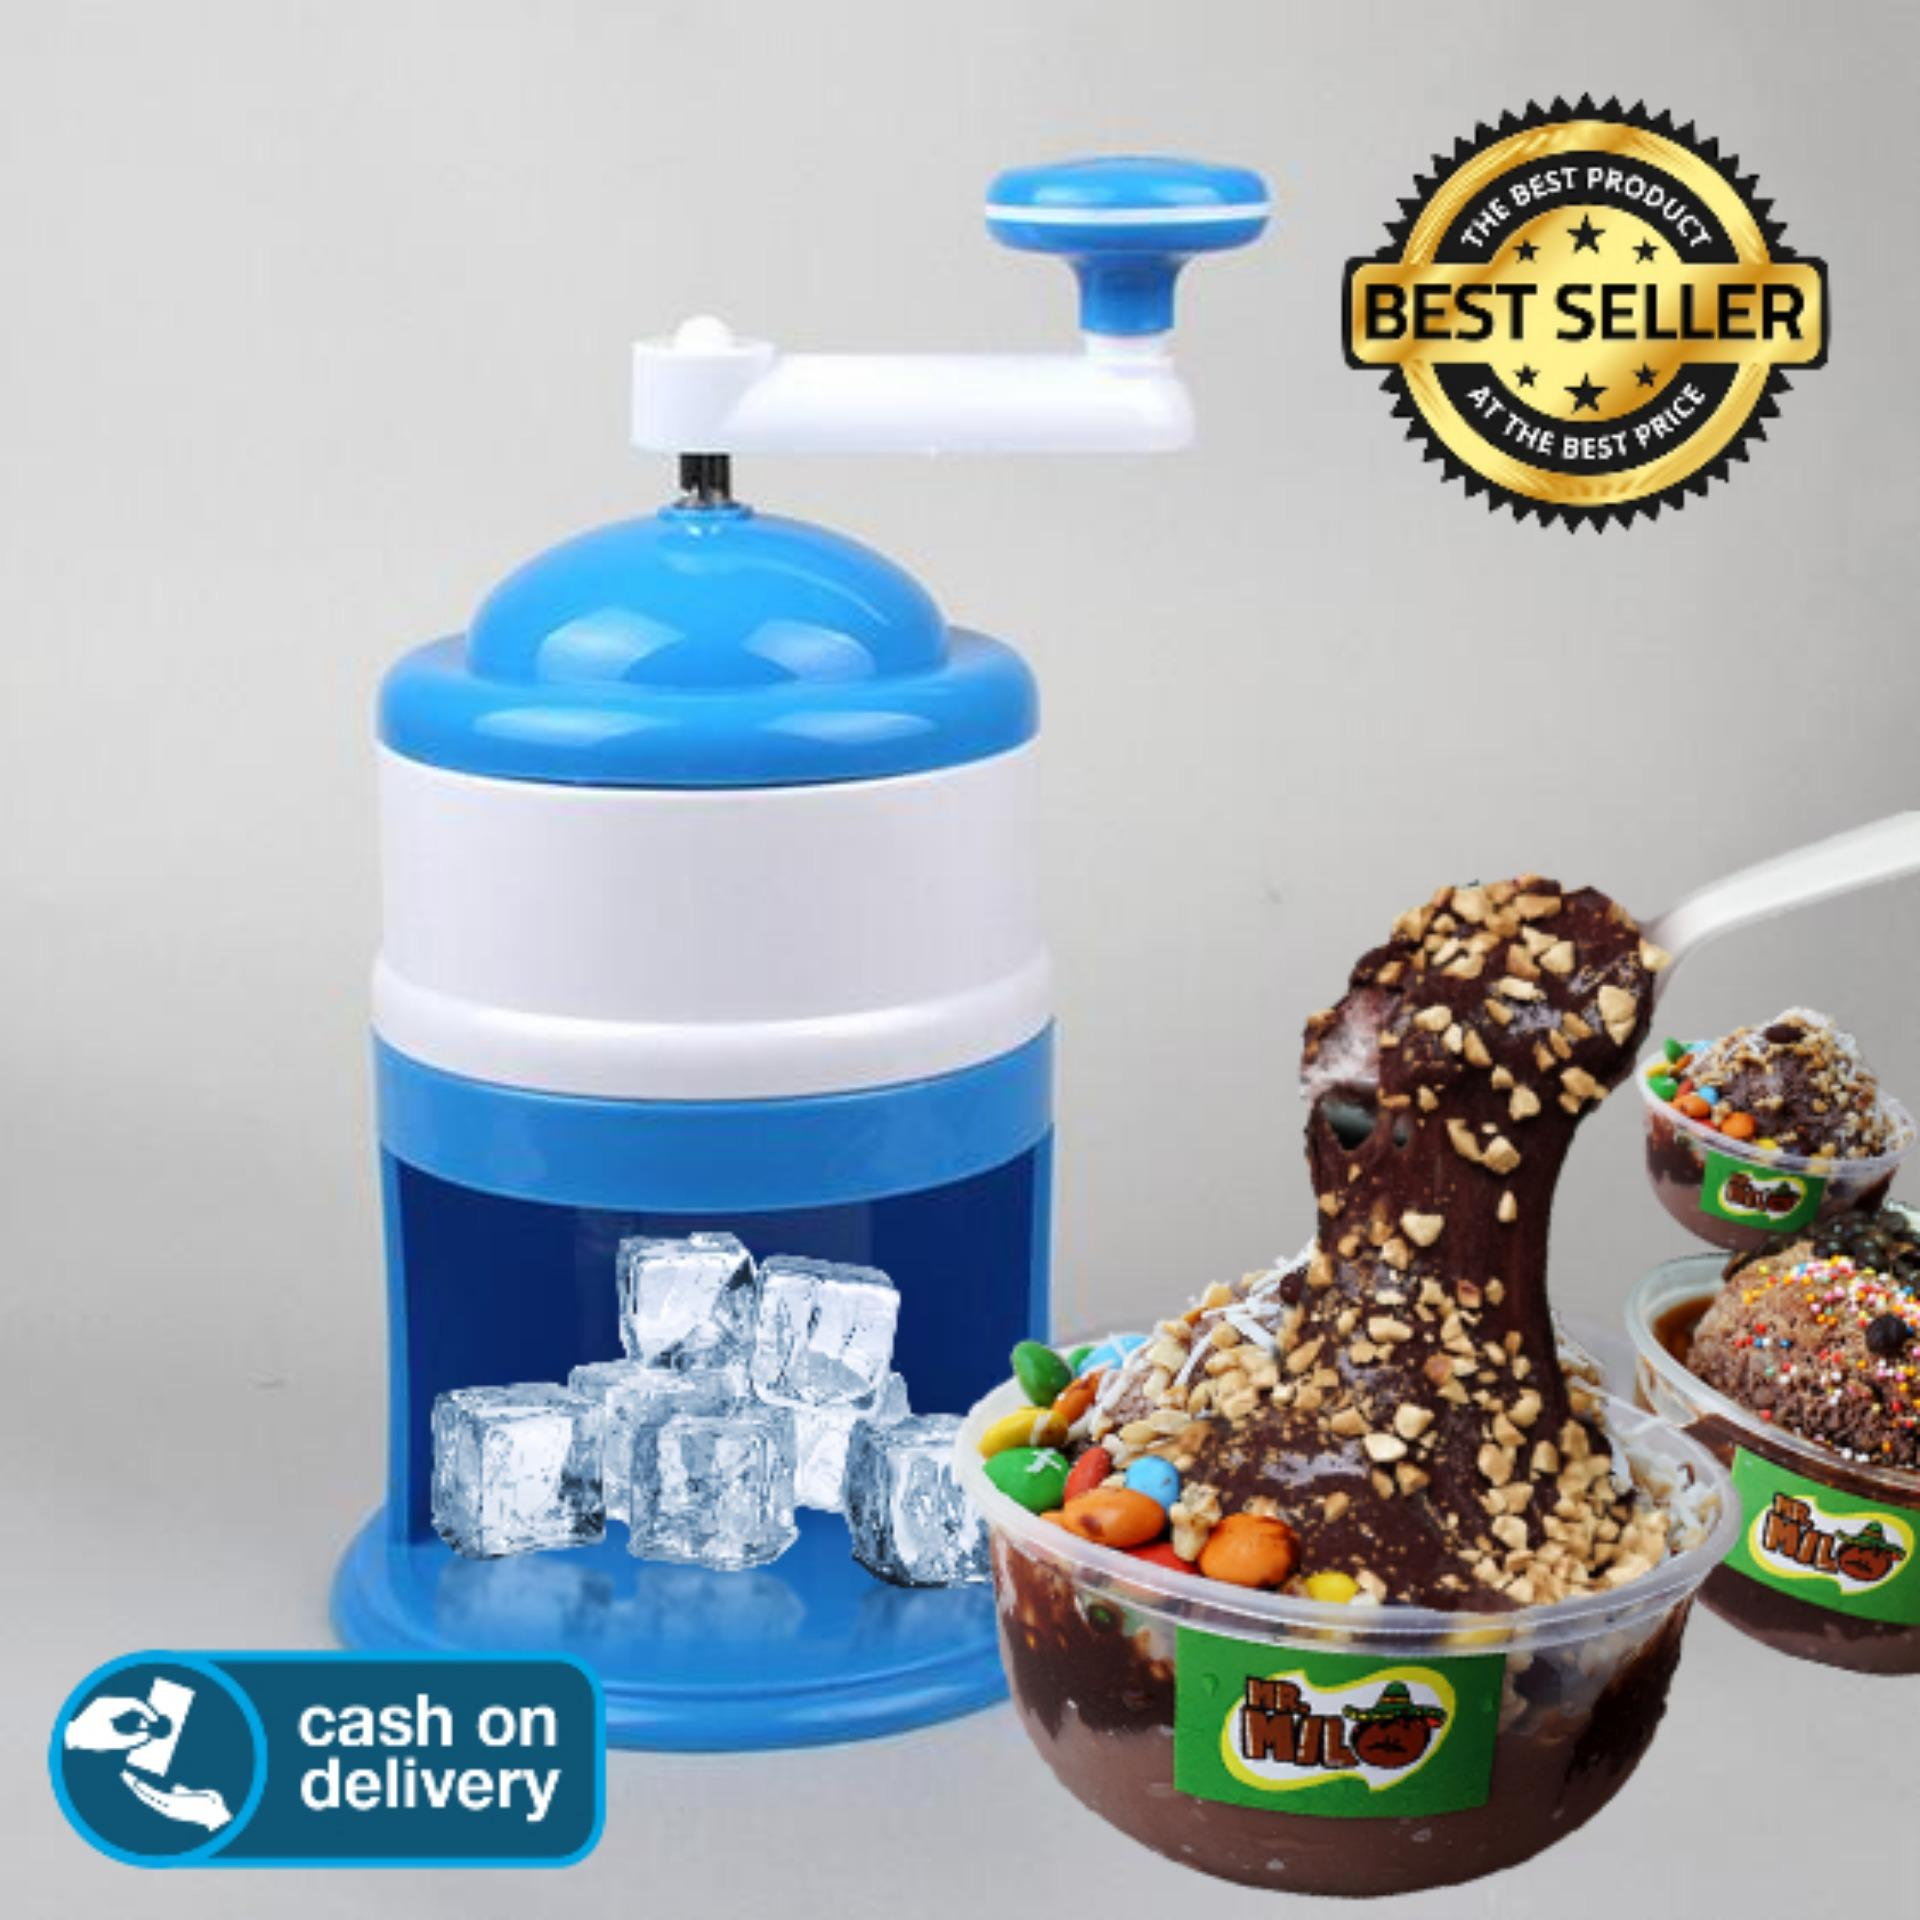 Big King Shop - Mesin Alat Serutan ES KEPAL MILO Es Batu Portable ICE CRUSHER /